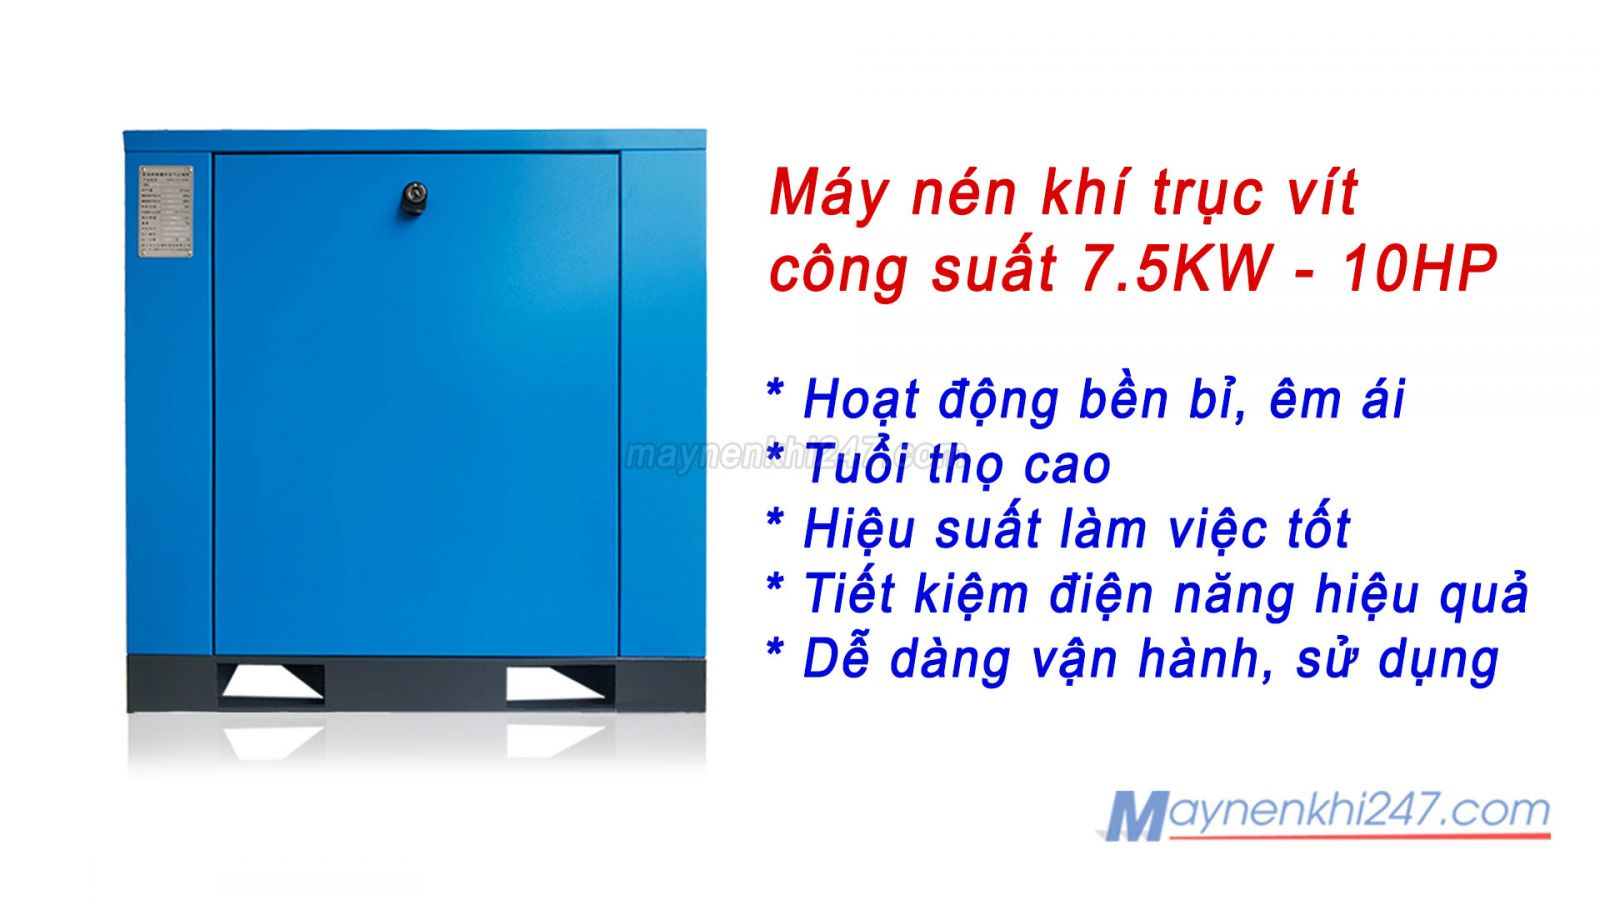 may-nen-khi-truc-vit-7.5kw-10hp